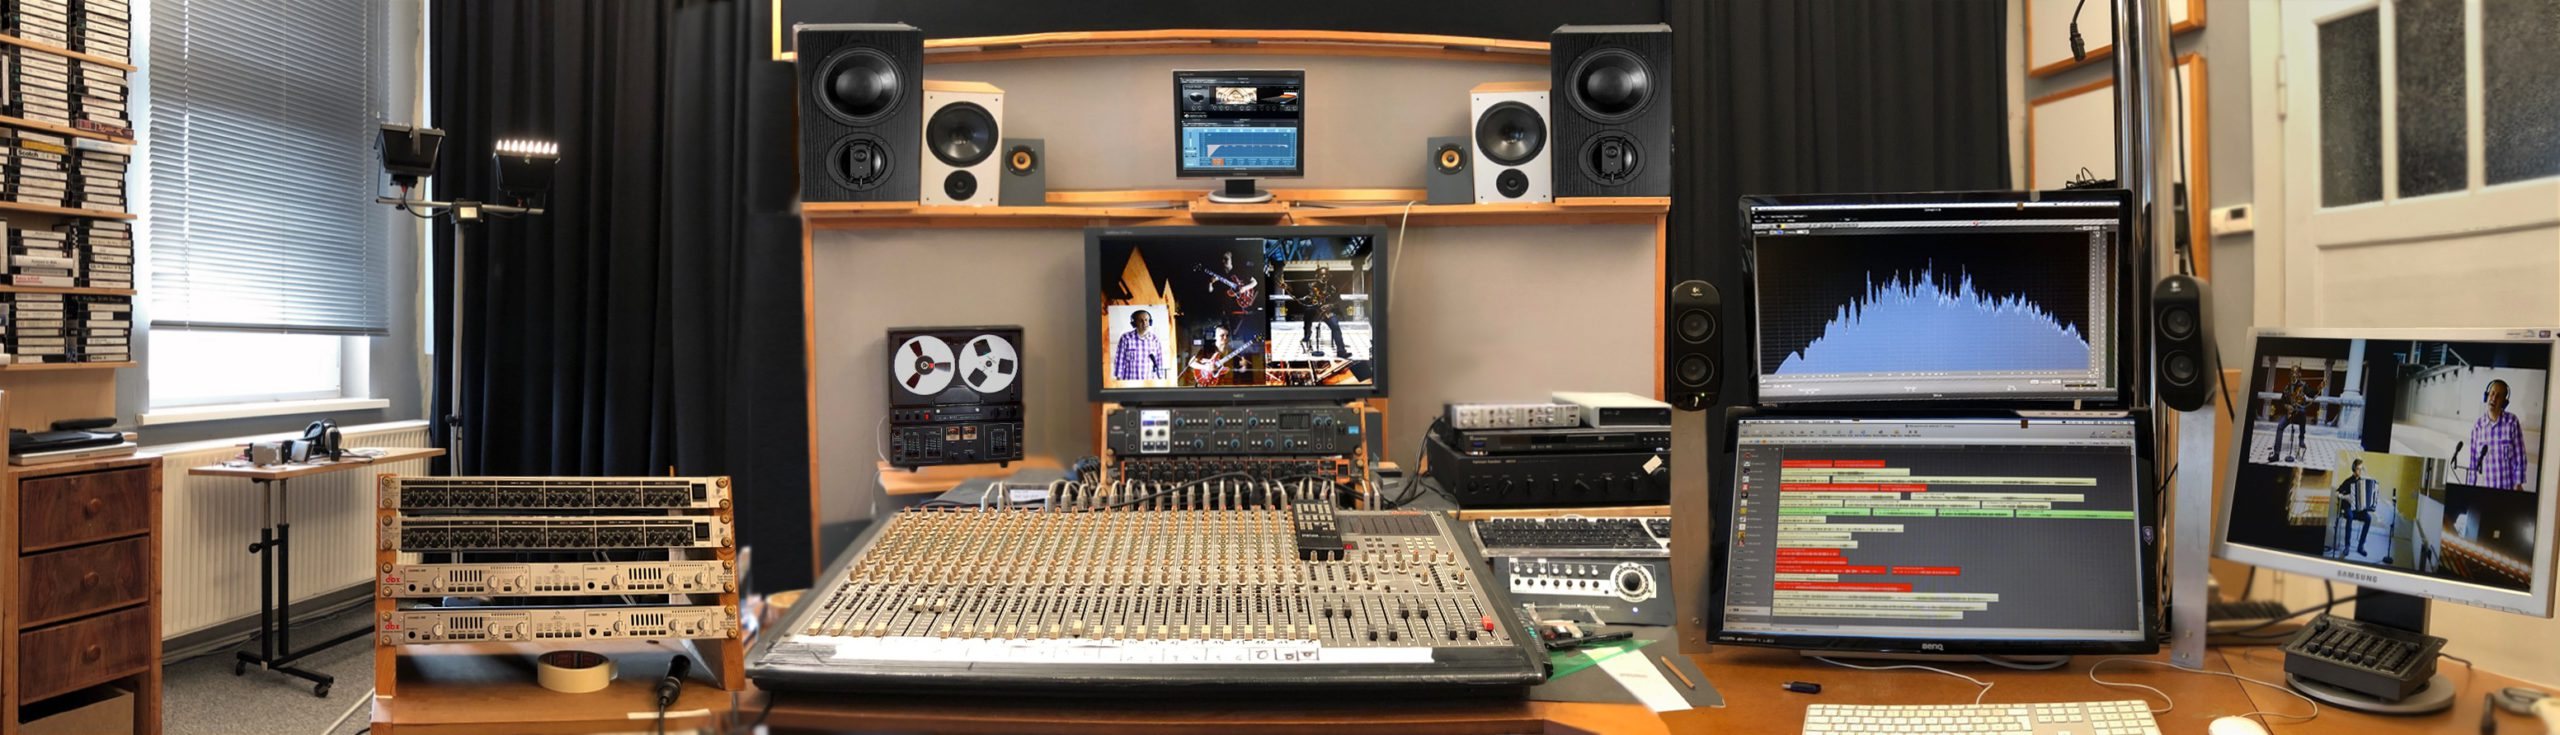 Studio Panorama alt geputzt